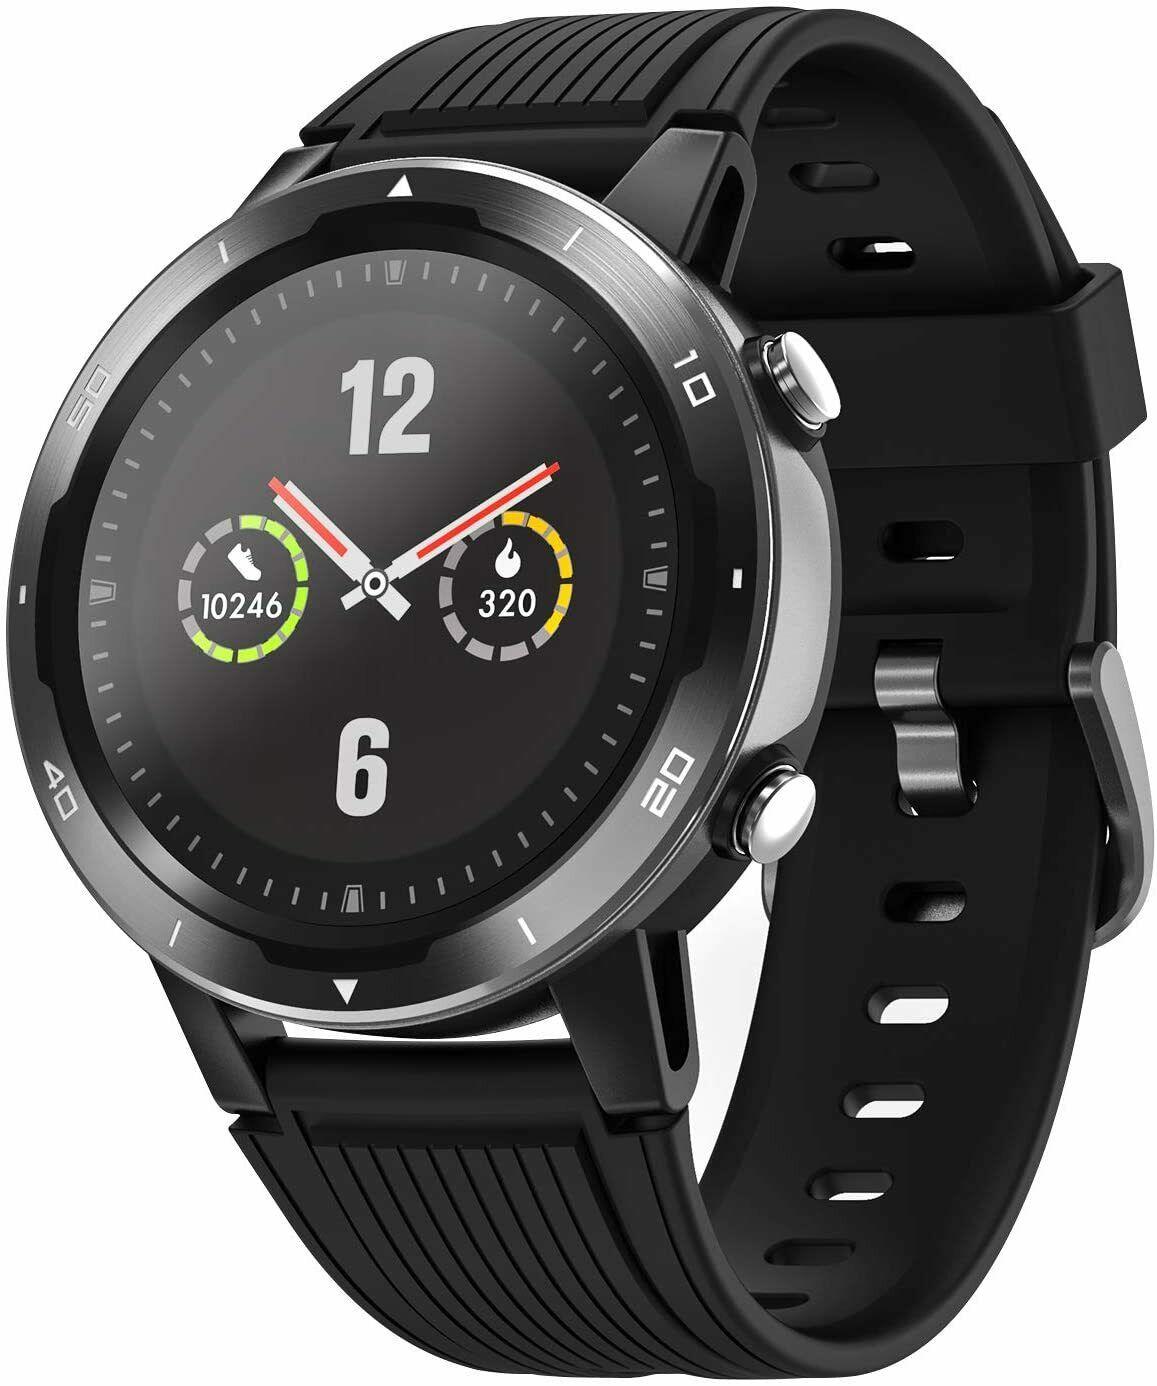 id215g smart watch oxygen saturation monitor